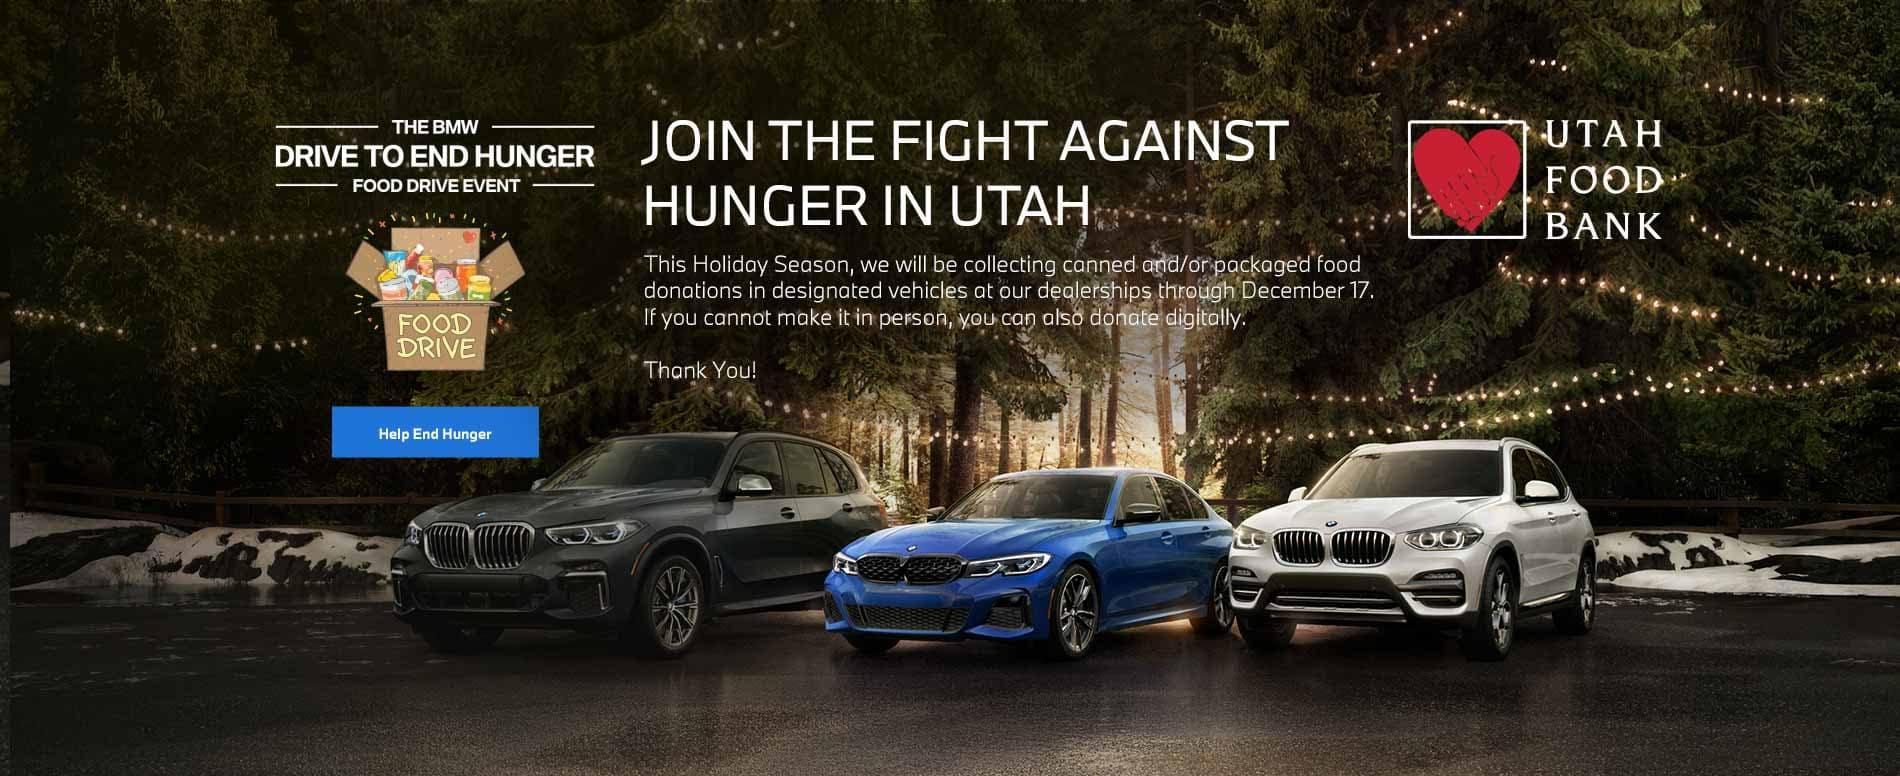 BMW Food Drive